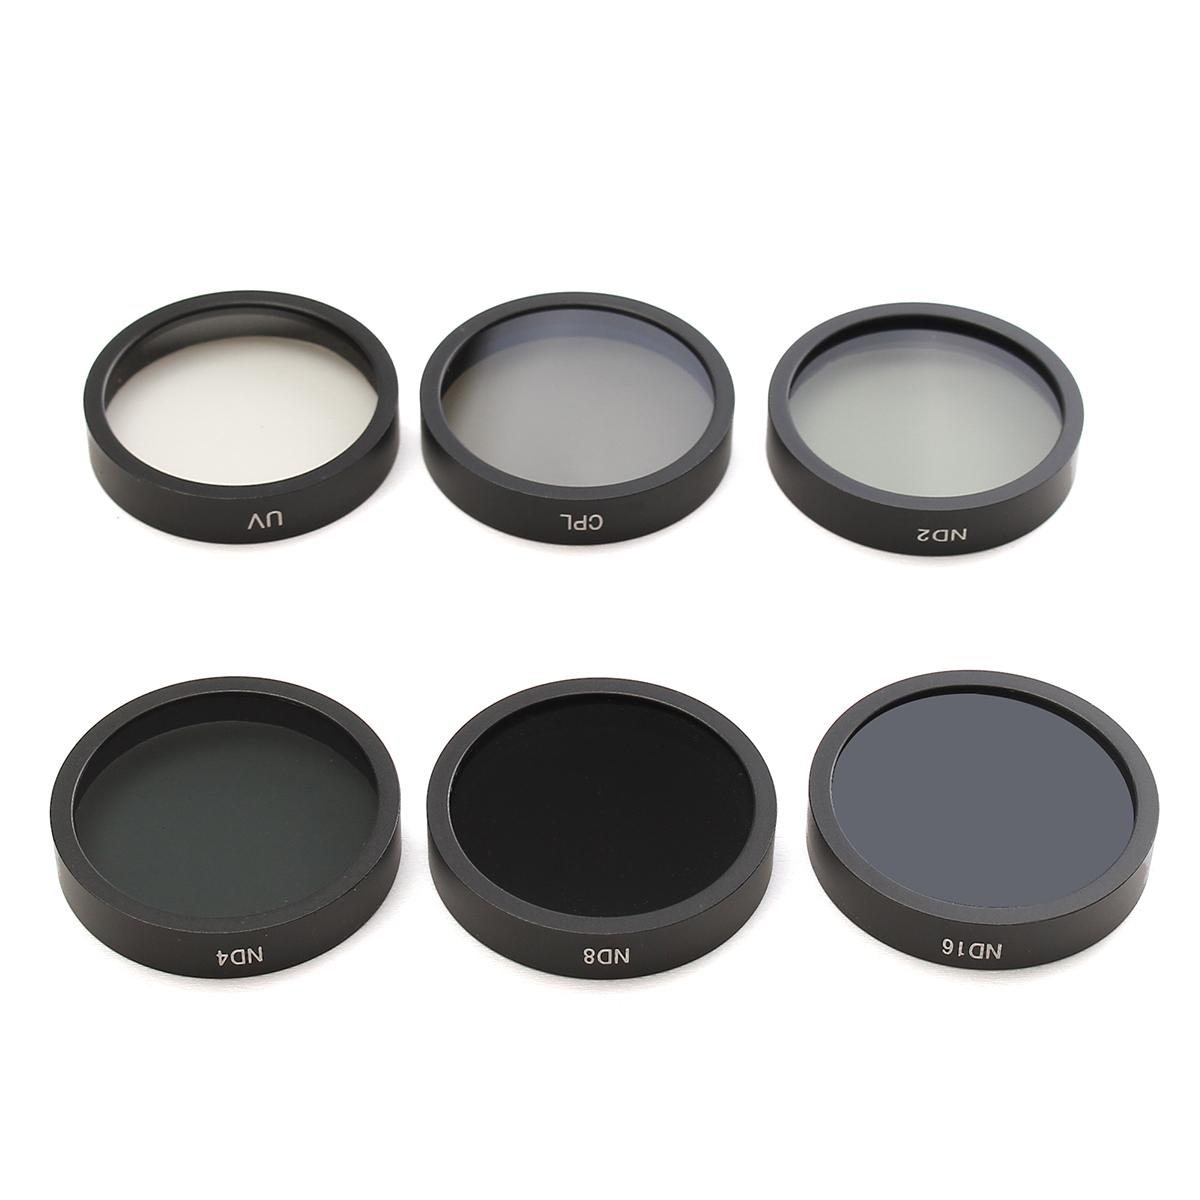 6 pz ND2 ND4 ND8 ND16 CPL UV Macchina Fotografica Lens Filtri Con Il Caso Per DJI Phantom 4/3 HD